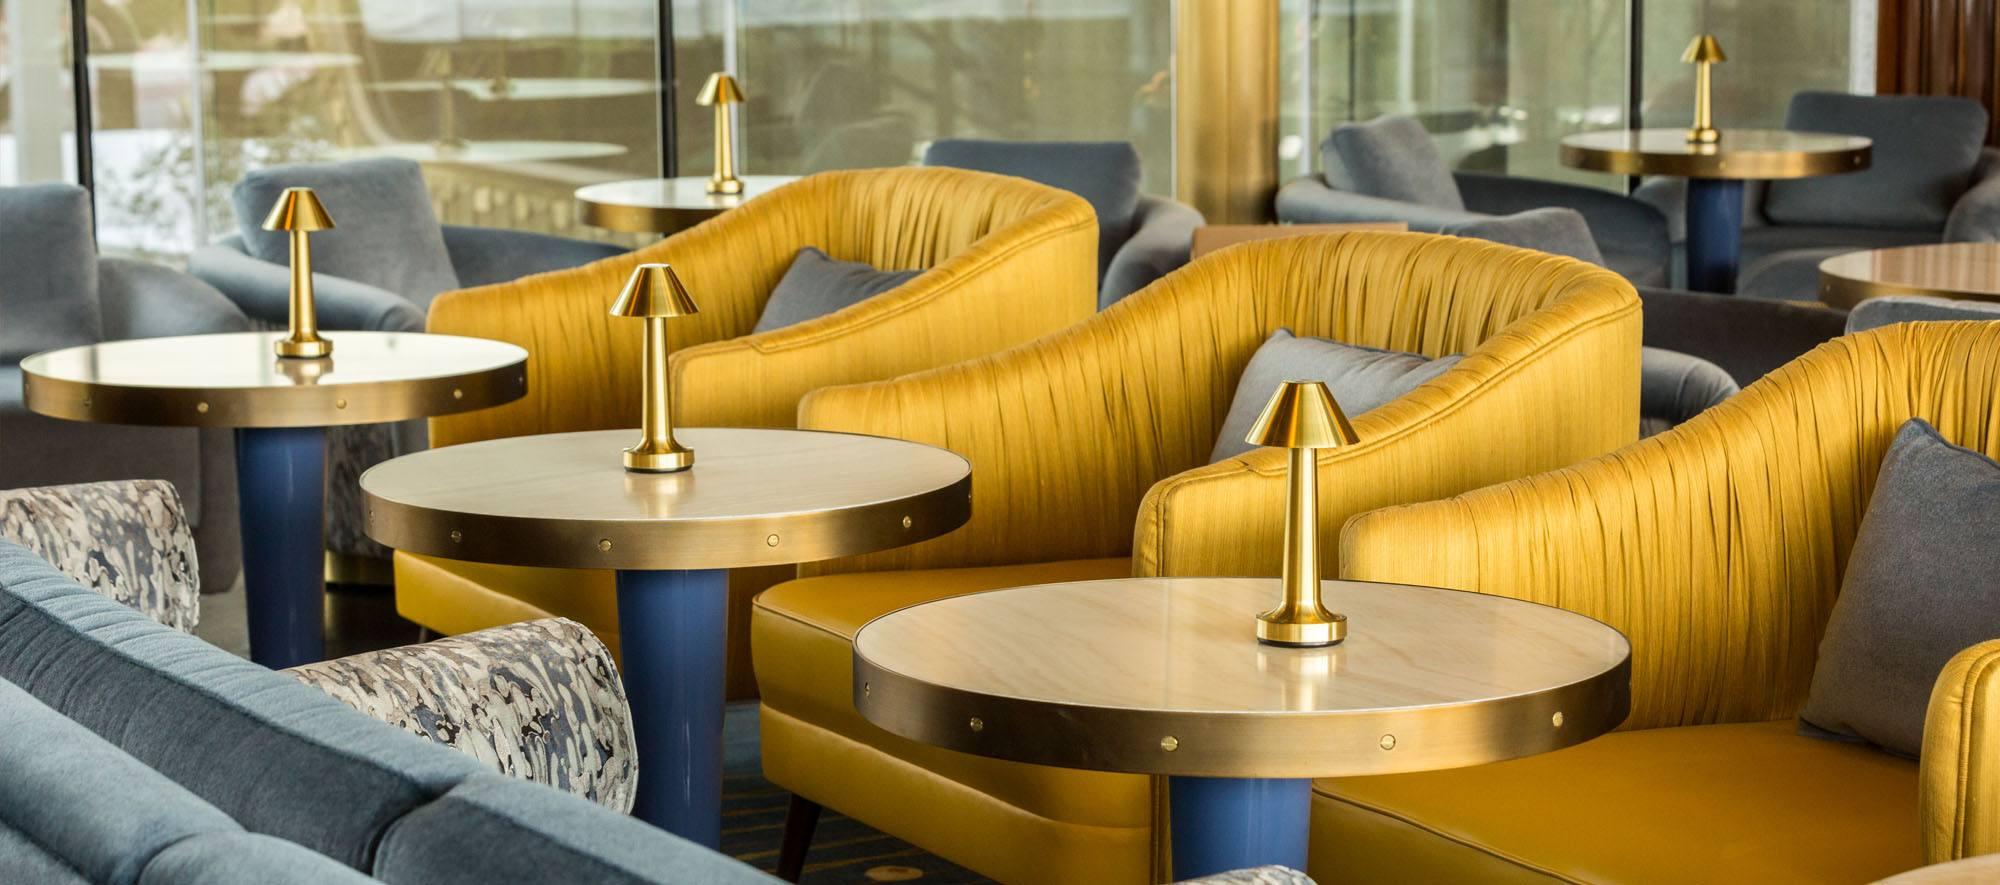 COOEE-3C-Lounge-Brass